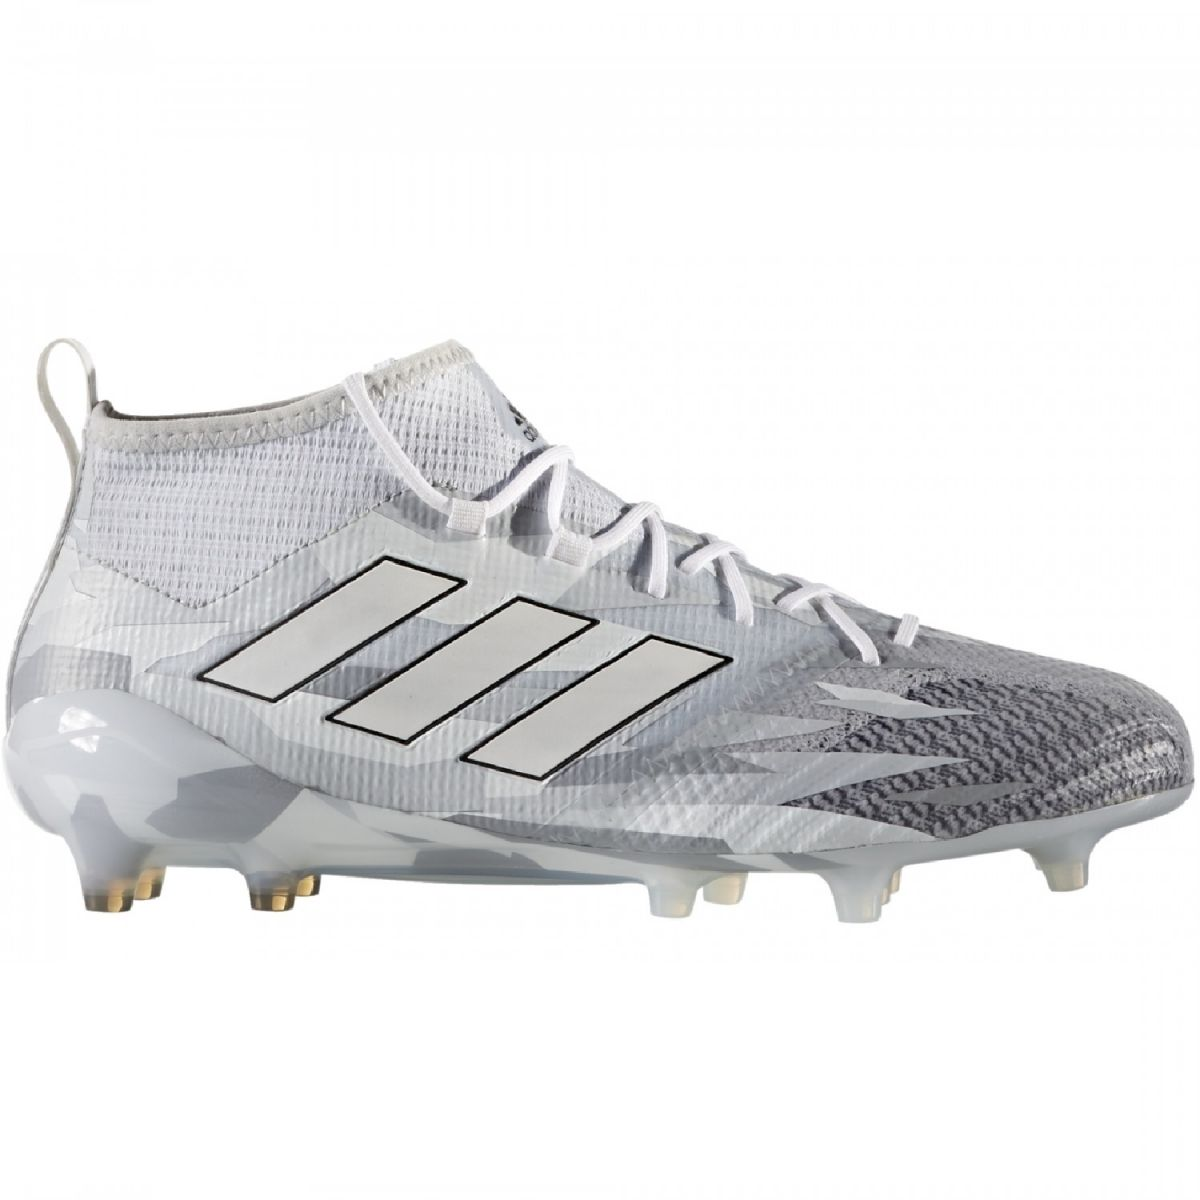 where can i buy adidas x ace soccer weiß grau d0c06 234c2